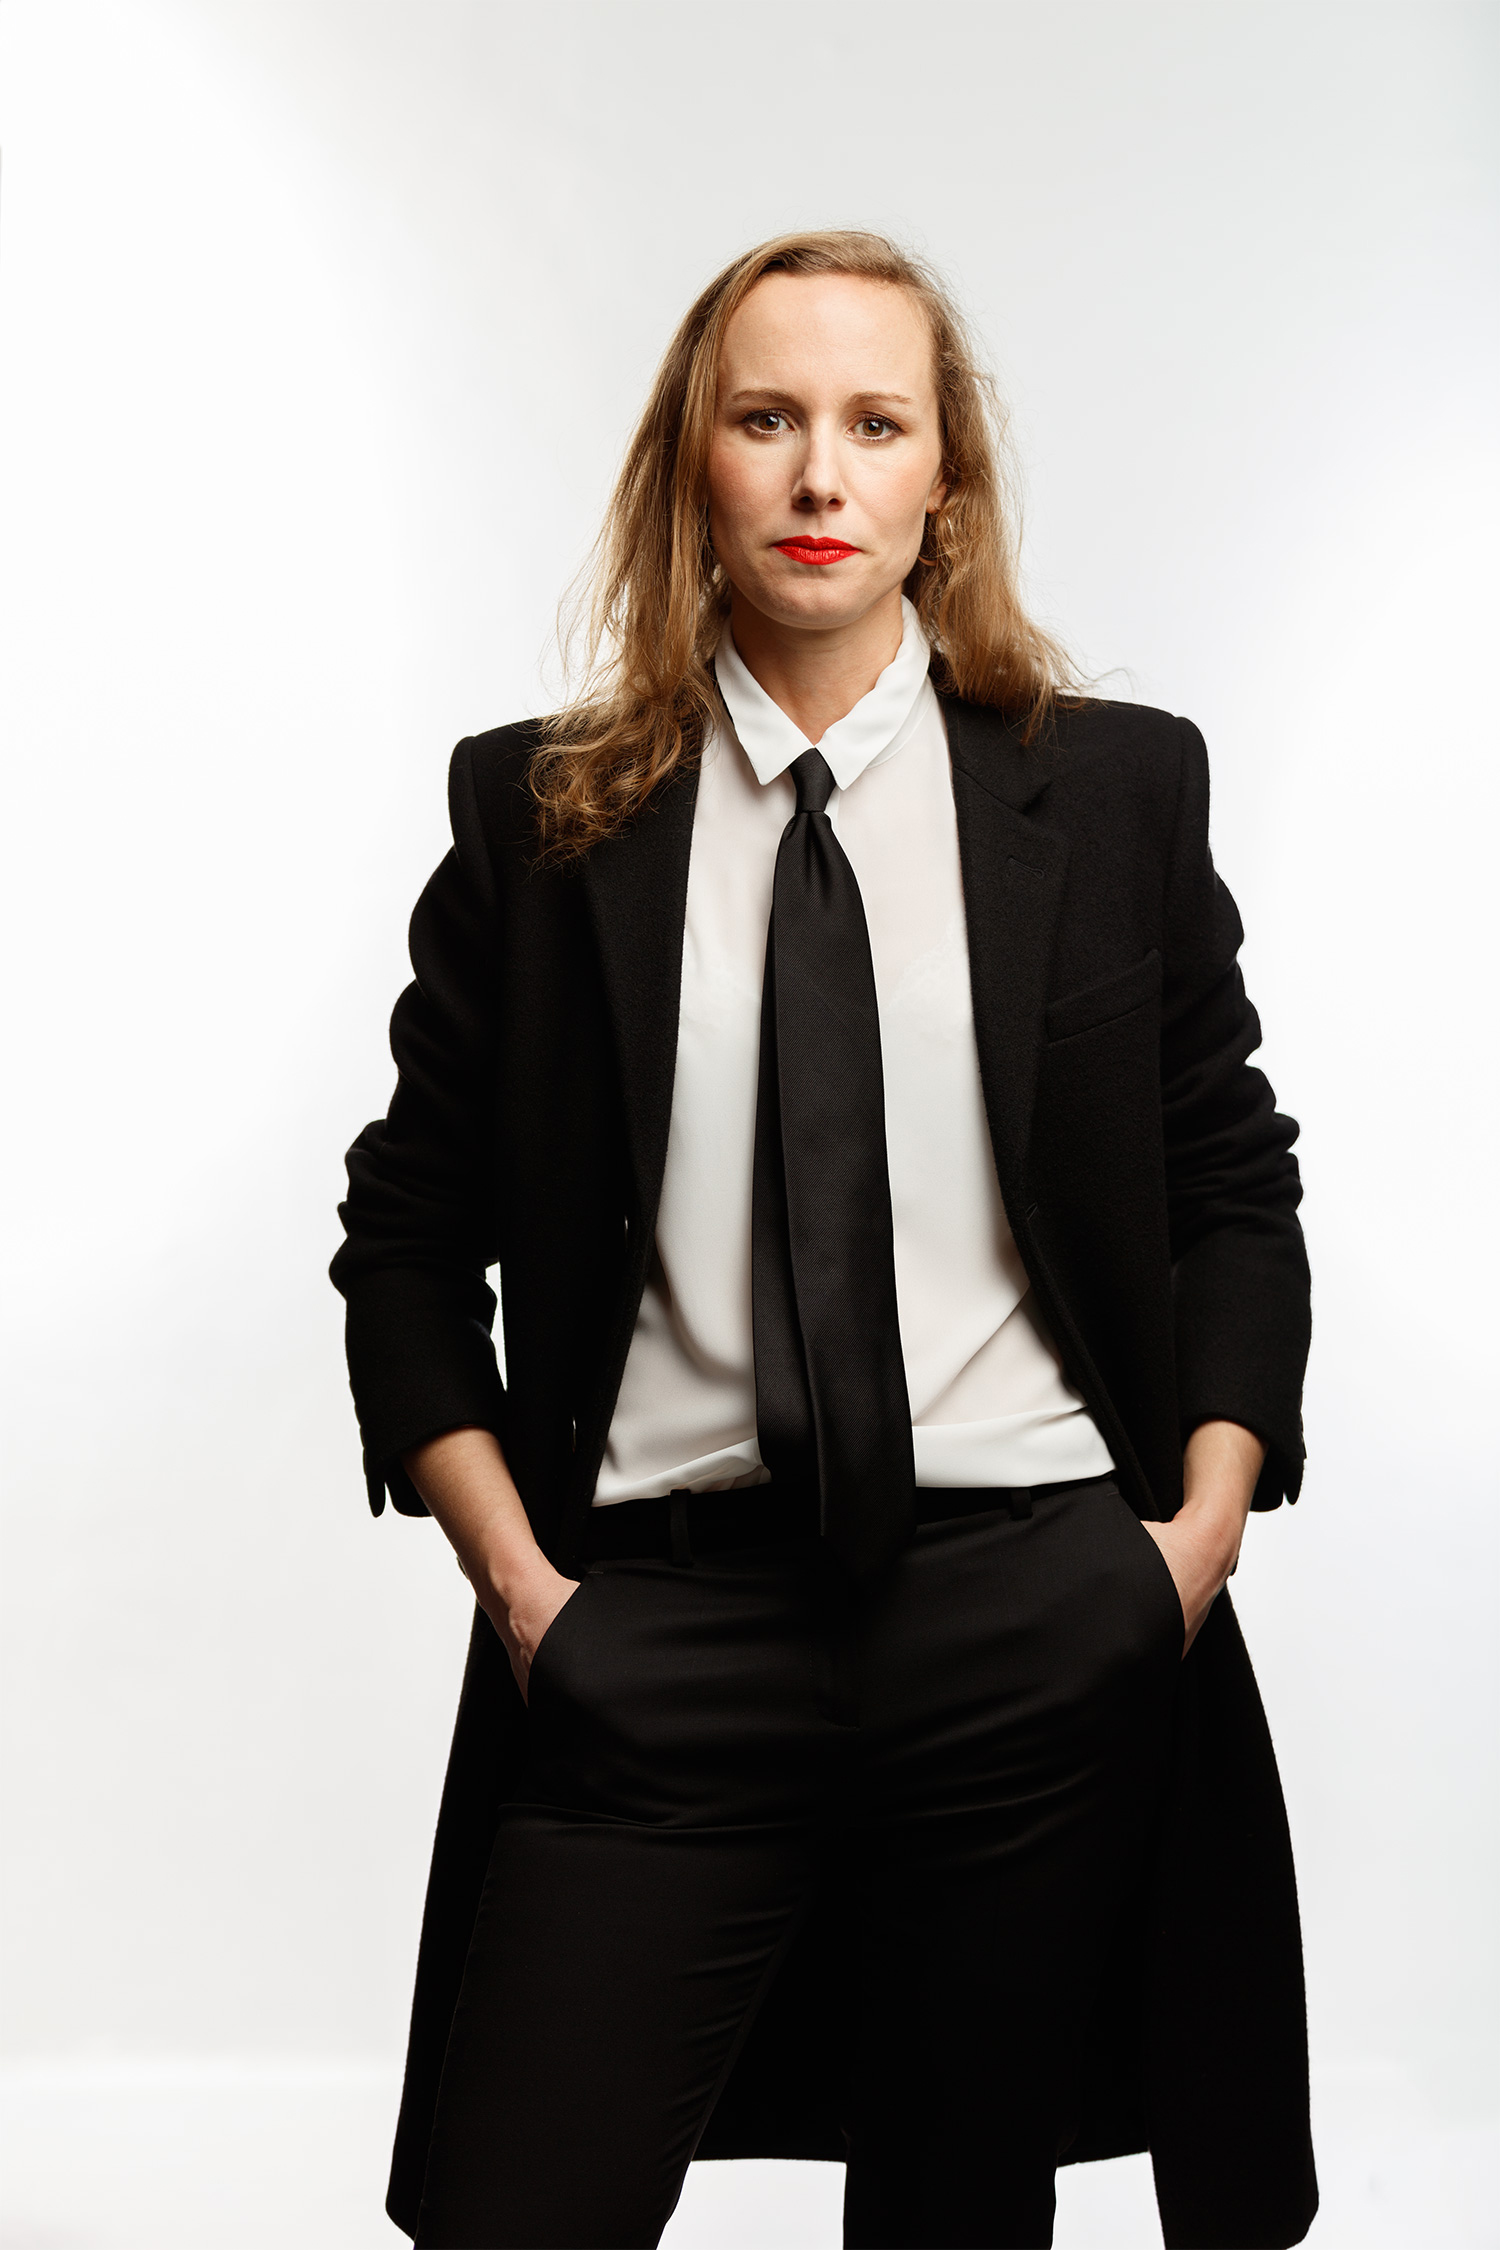 Émeline Charamon